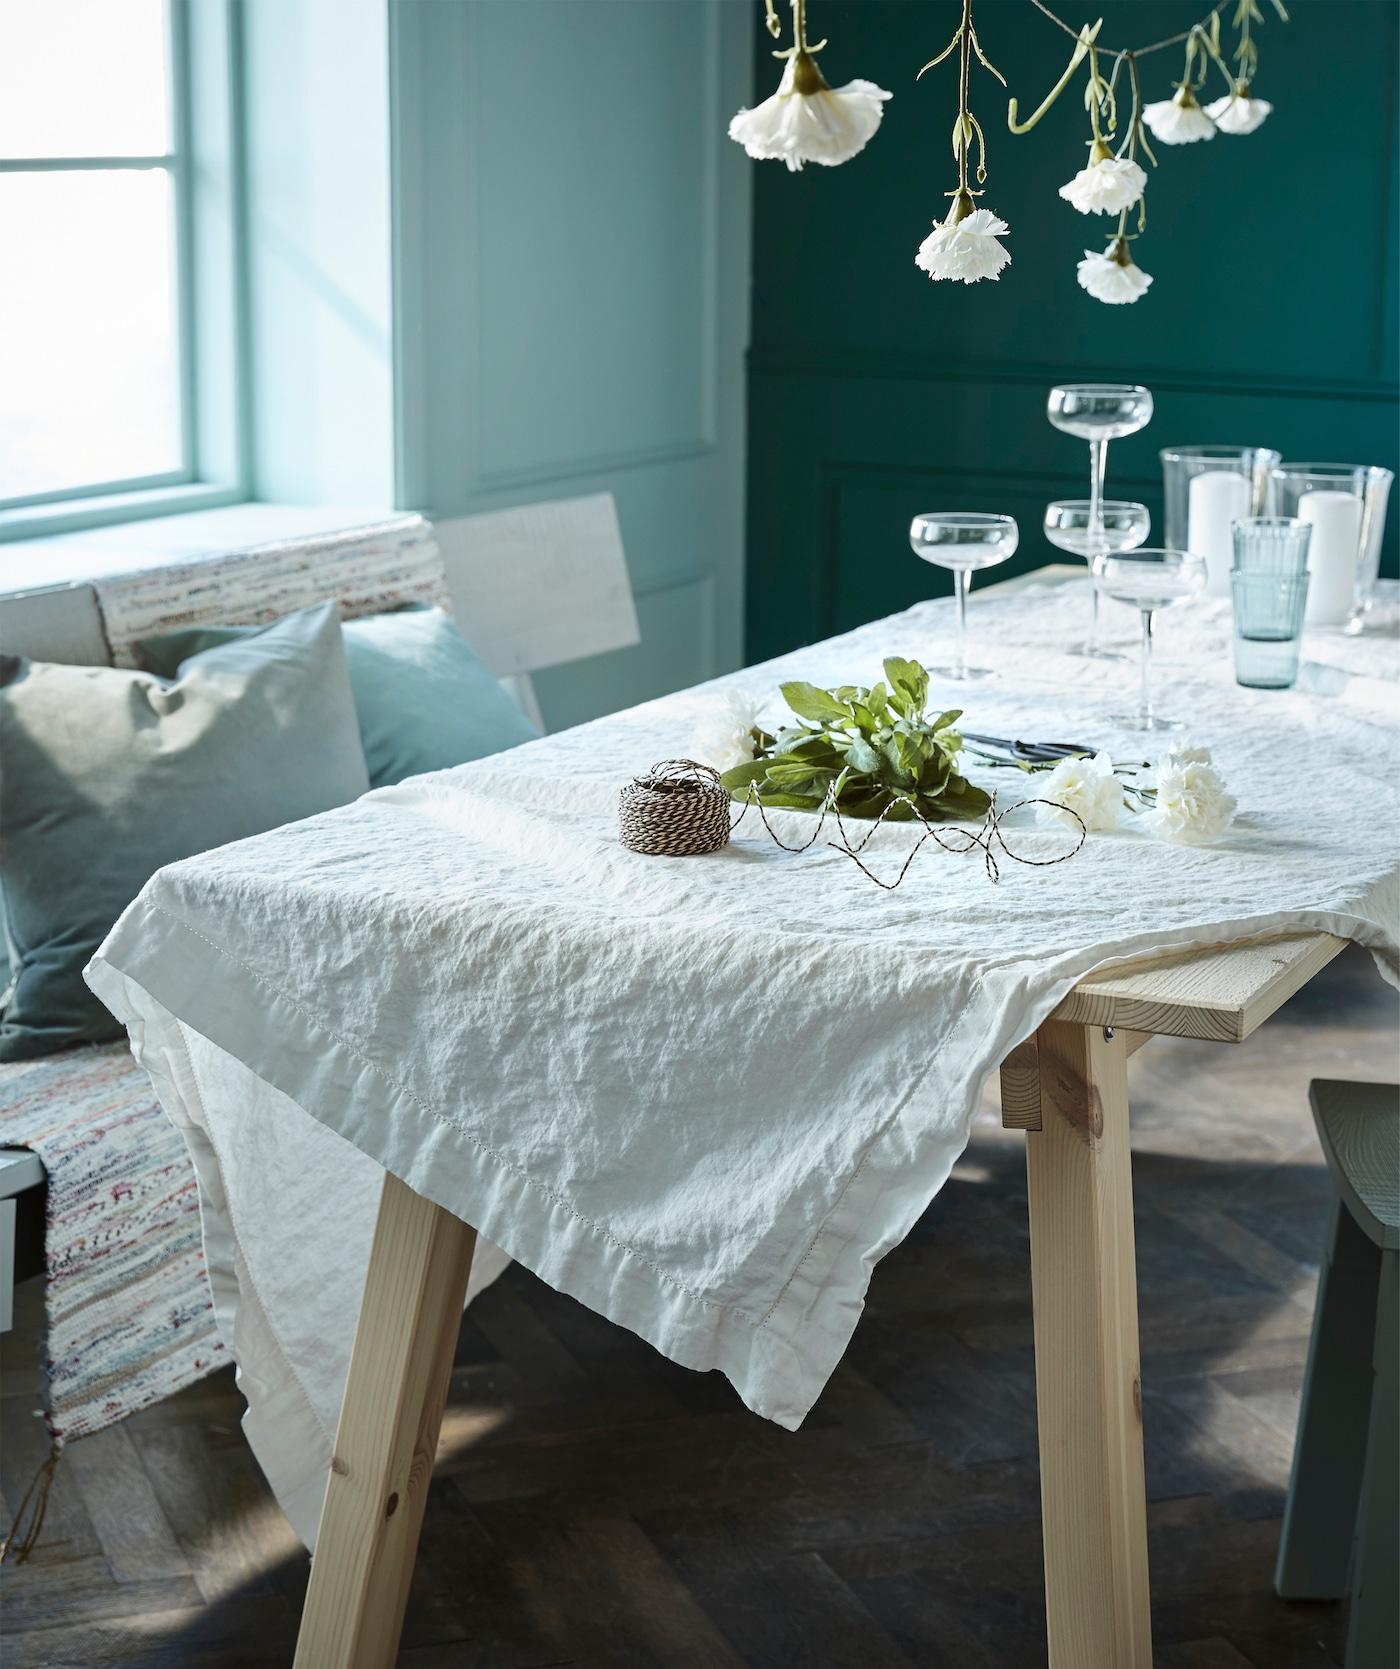 Create a sage green summer table – IKEA IKEA IT